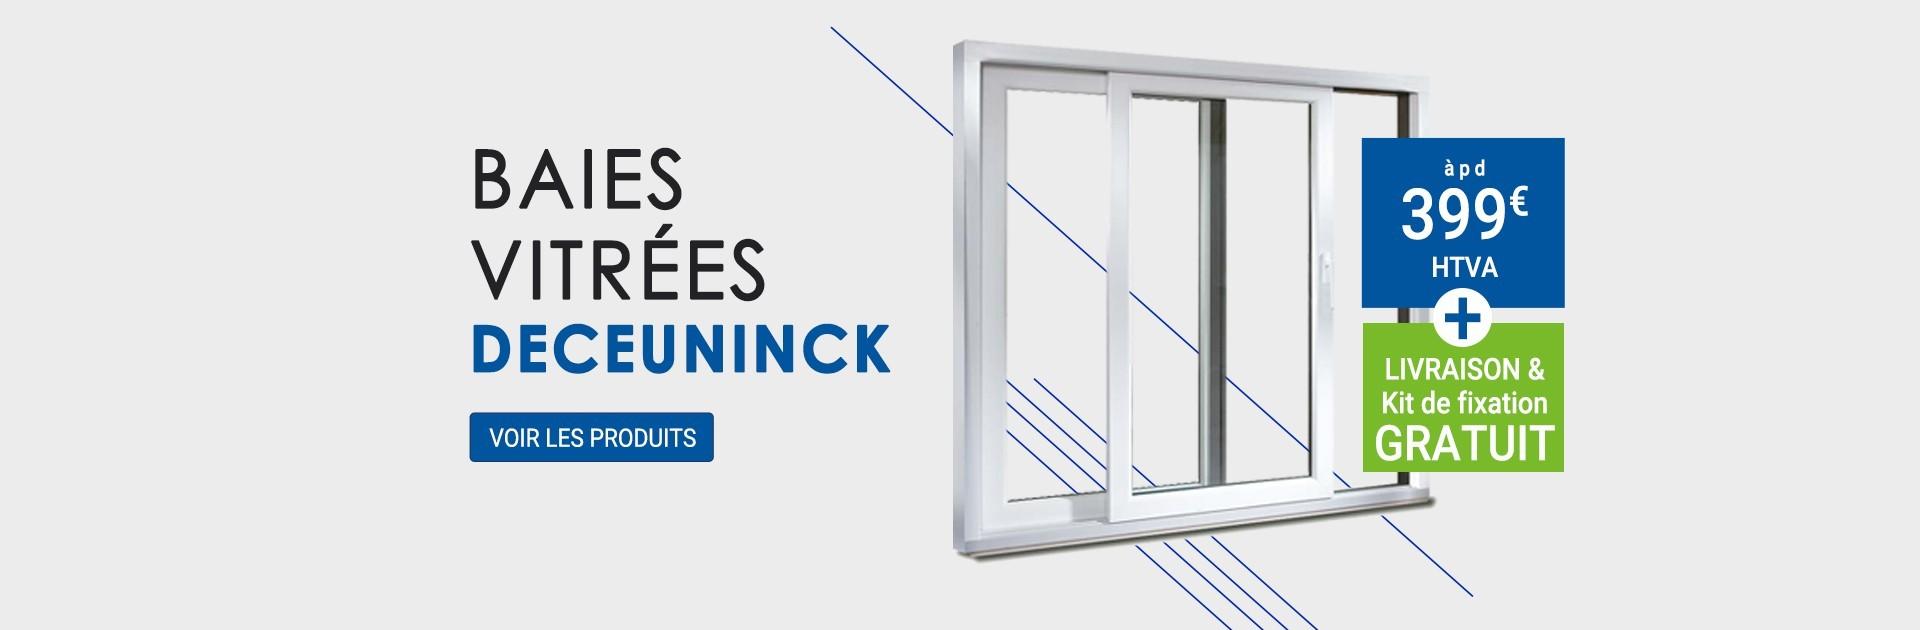 Baies vitrées Deceuninck àpd 399€ htva